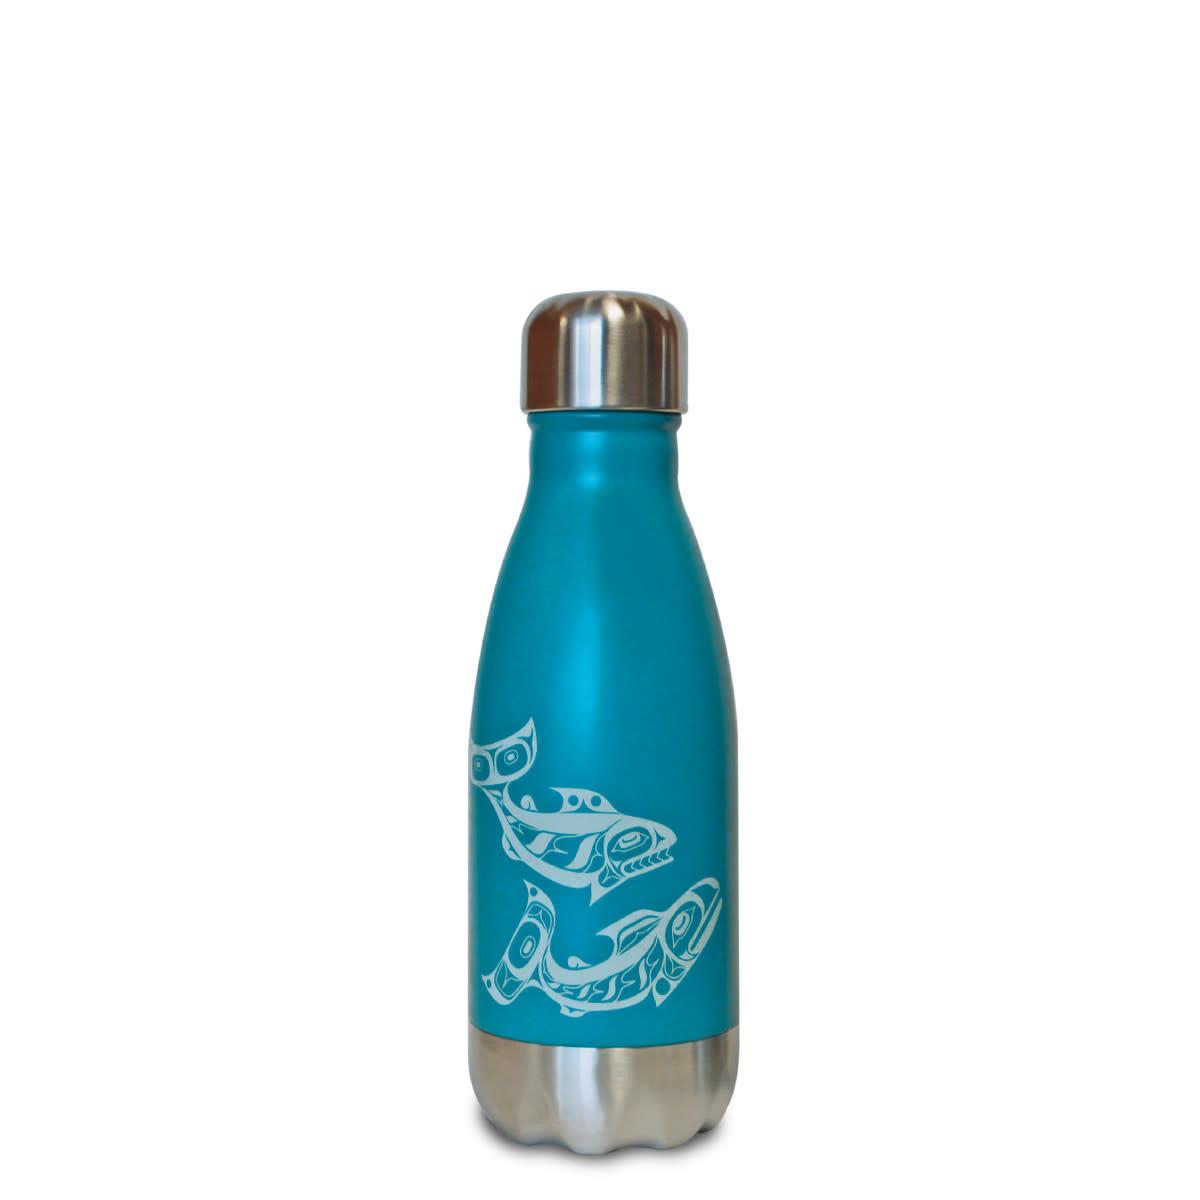 Insulated 9 oz Bottle - Salmon by Allan Weir-1